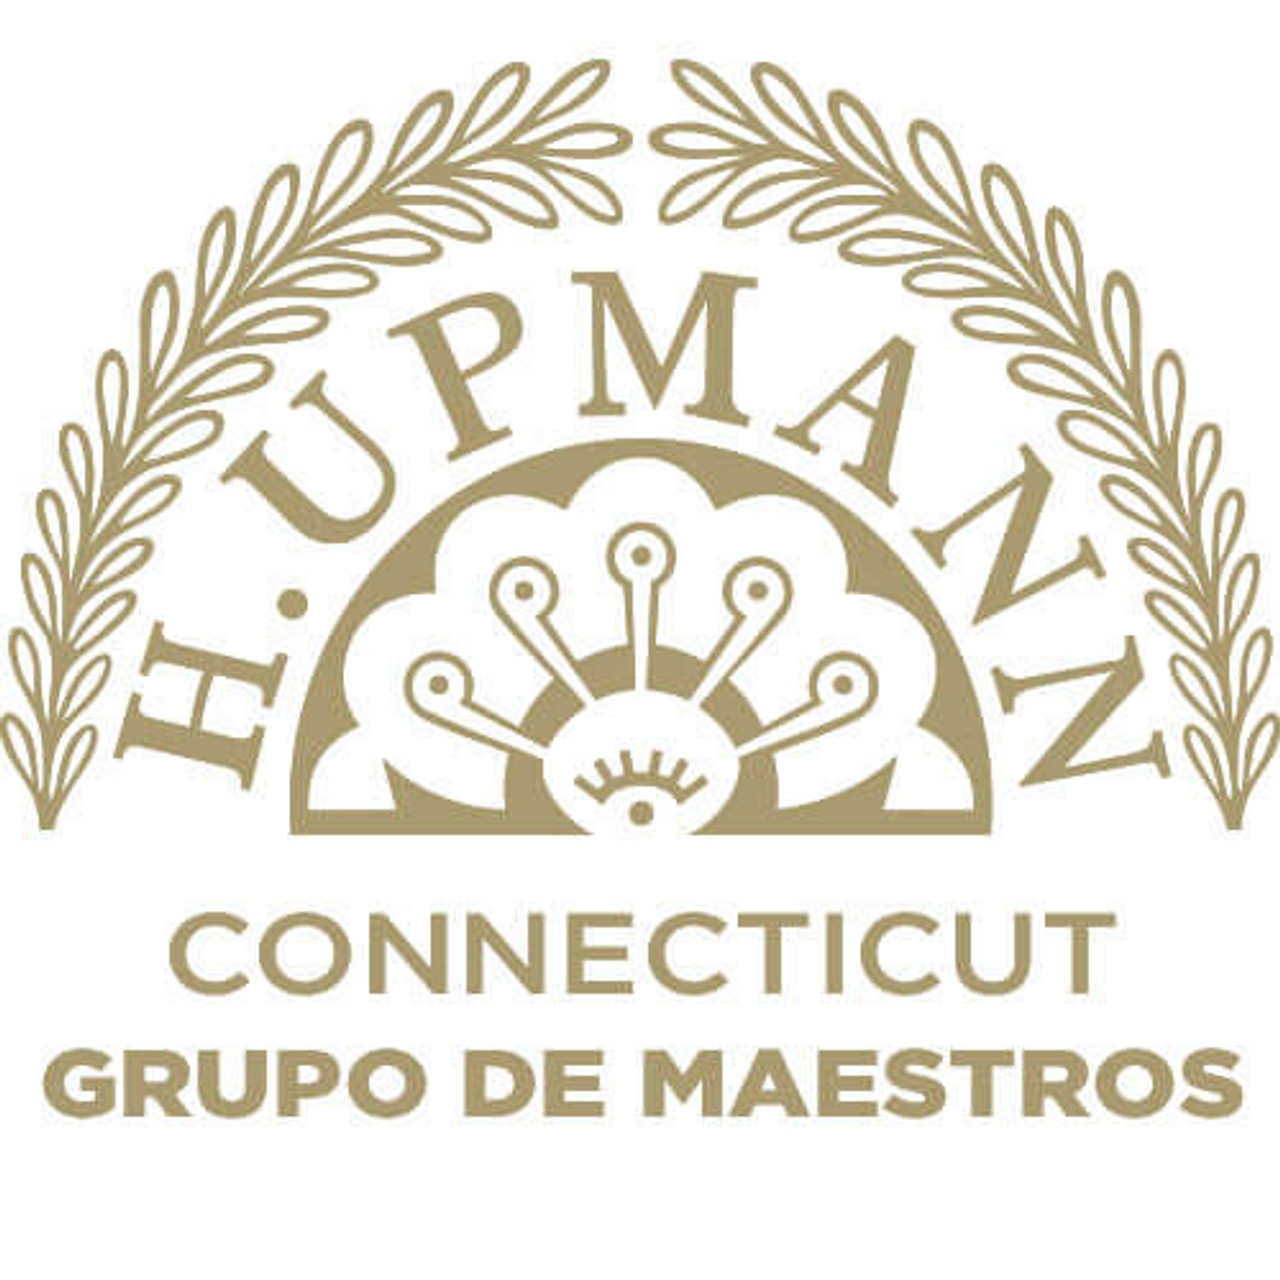 H. Upmann Connecticut by Grupo de Maestros Belicoso Cigars - 6.5 x 52 (Box of 20)